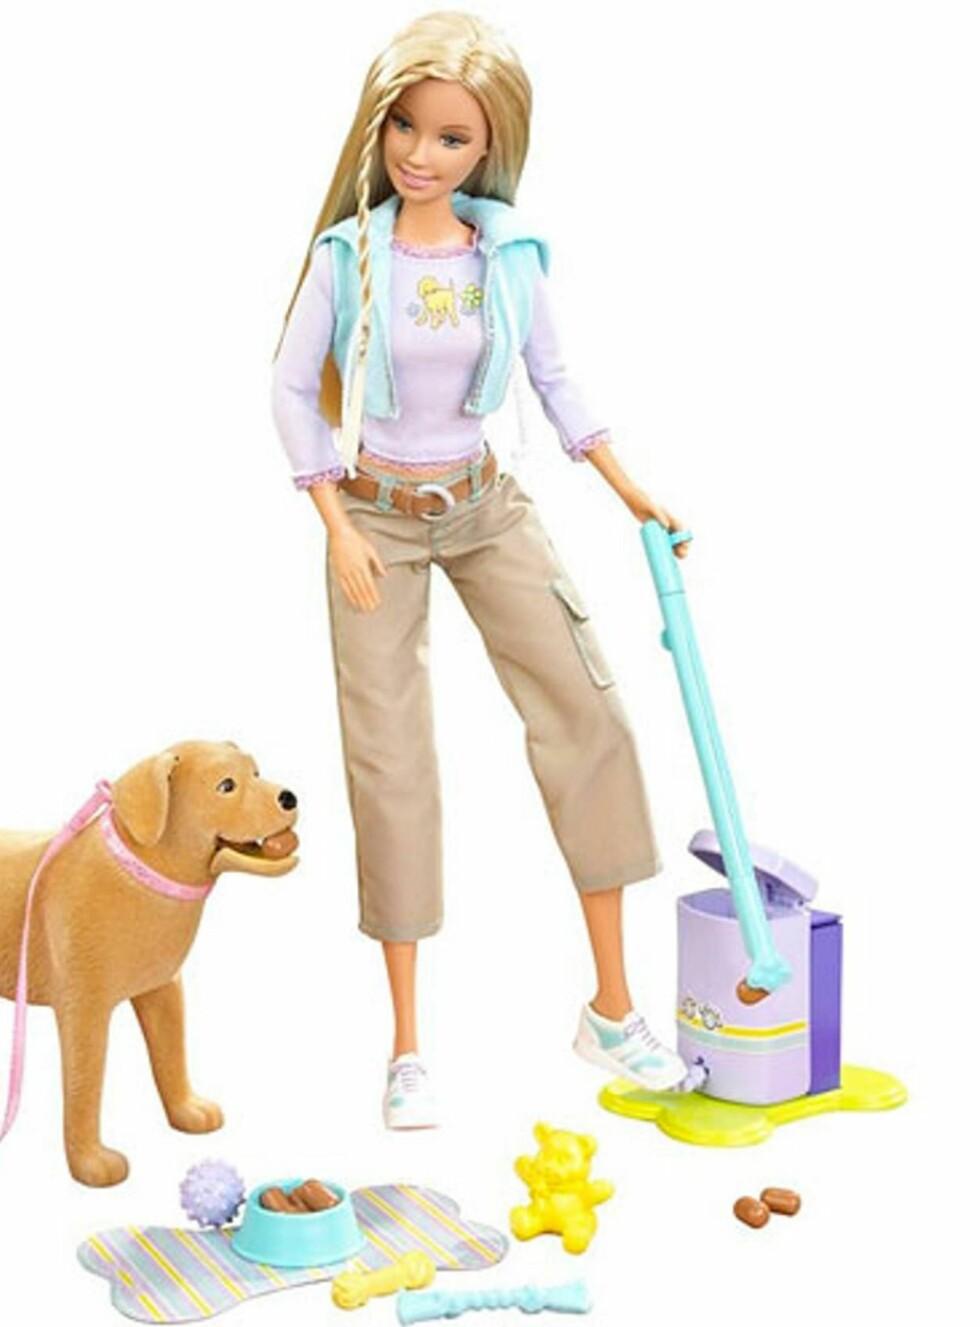 BJEFF: Barbie rydder opp med et smil! Foto: Mattel